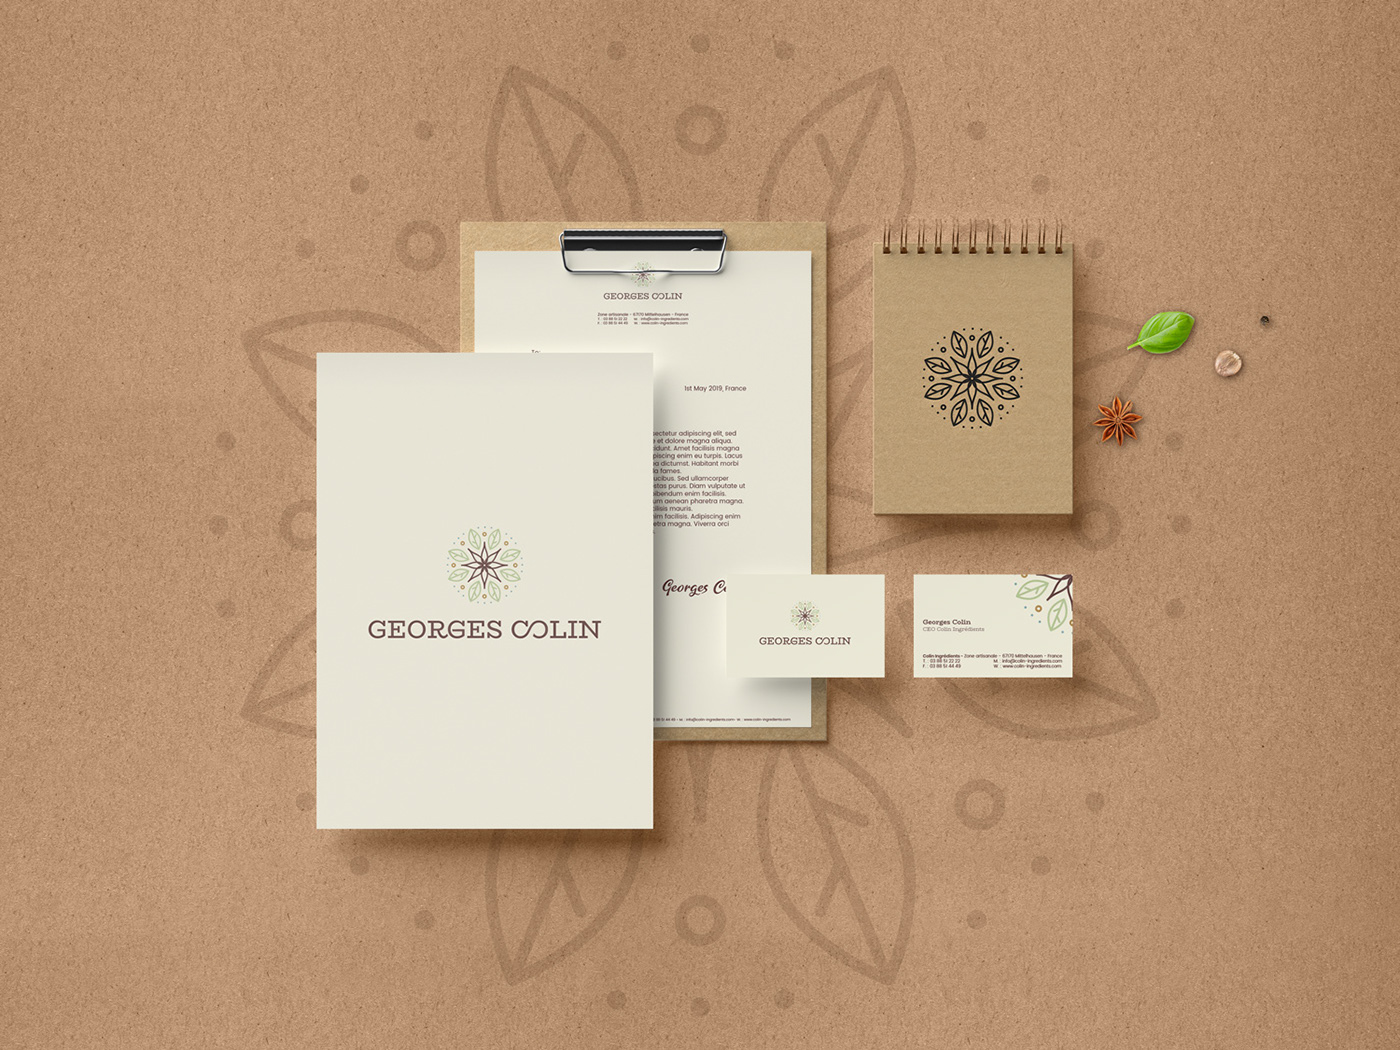 packaging design Branding design Logo Design Food Packaging Packaging branding  design graphic design  logo Design Director